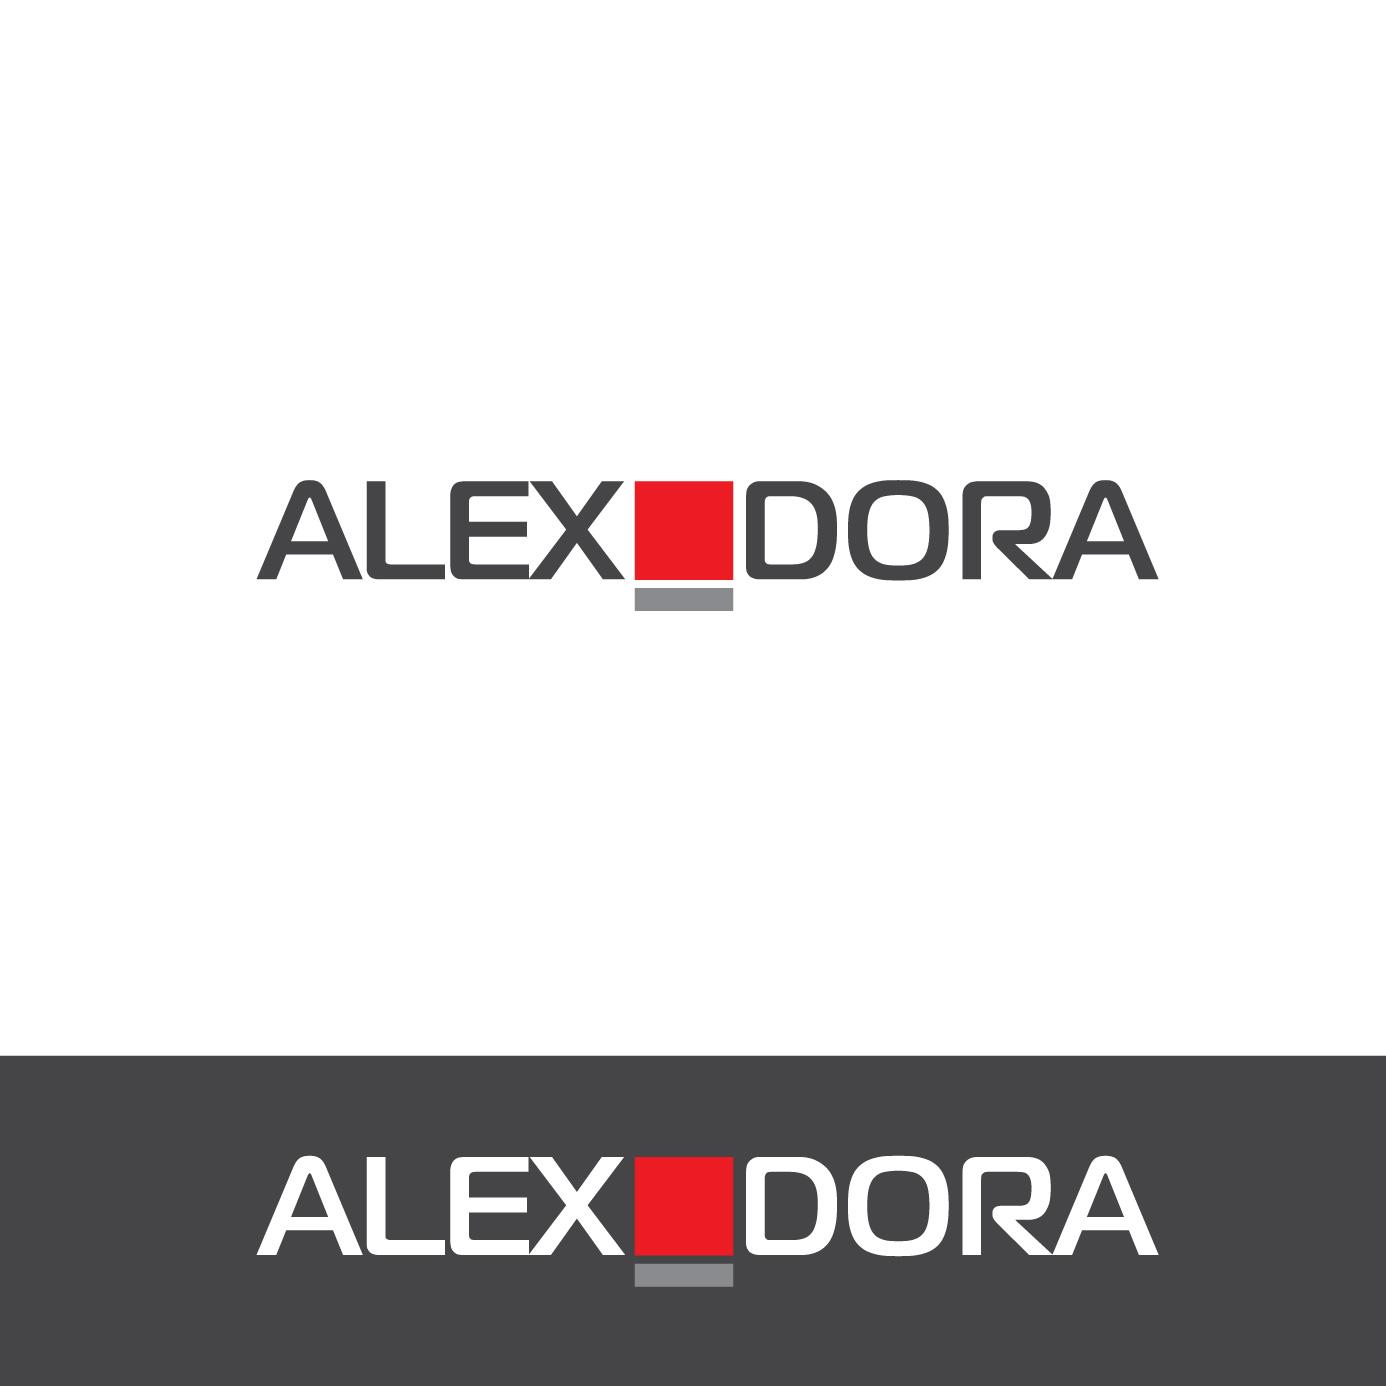 Необходим дизайнер для доработки логотипа бренда одежды фото f_3115b3905b89c4e6.jpg